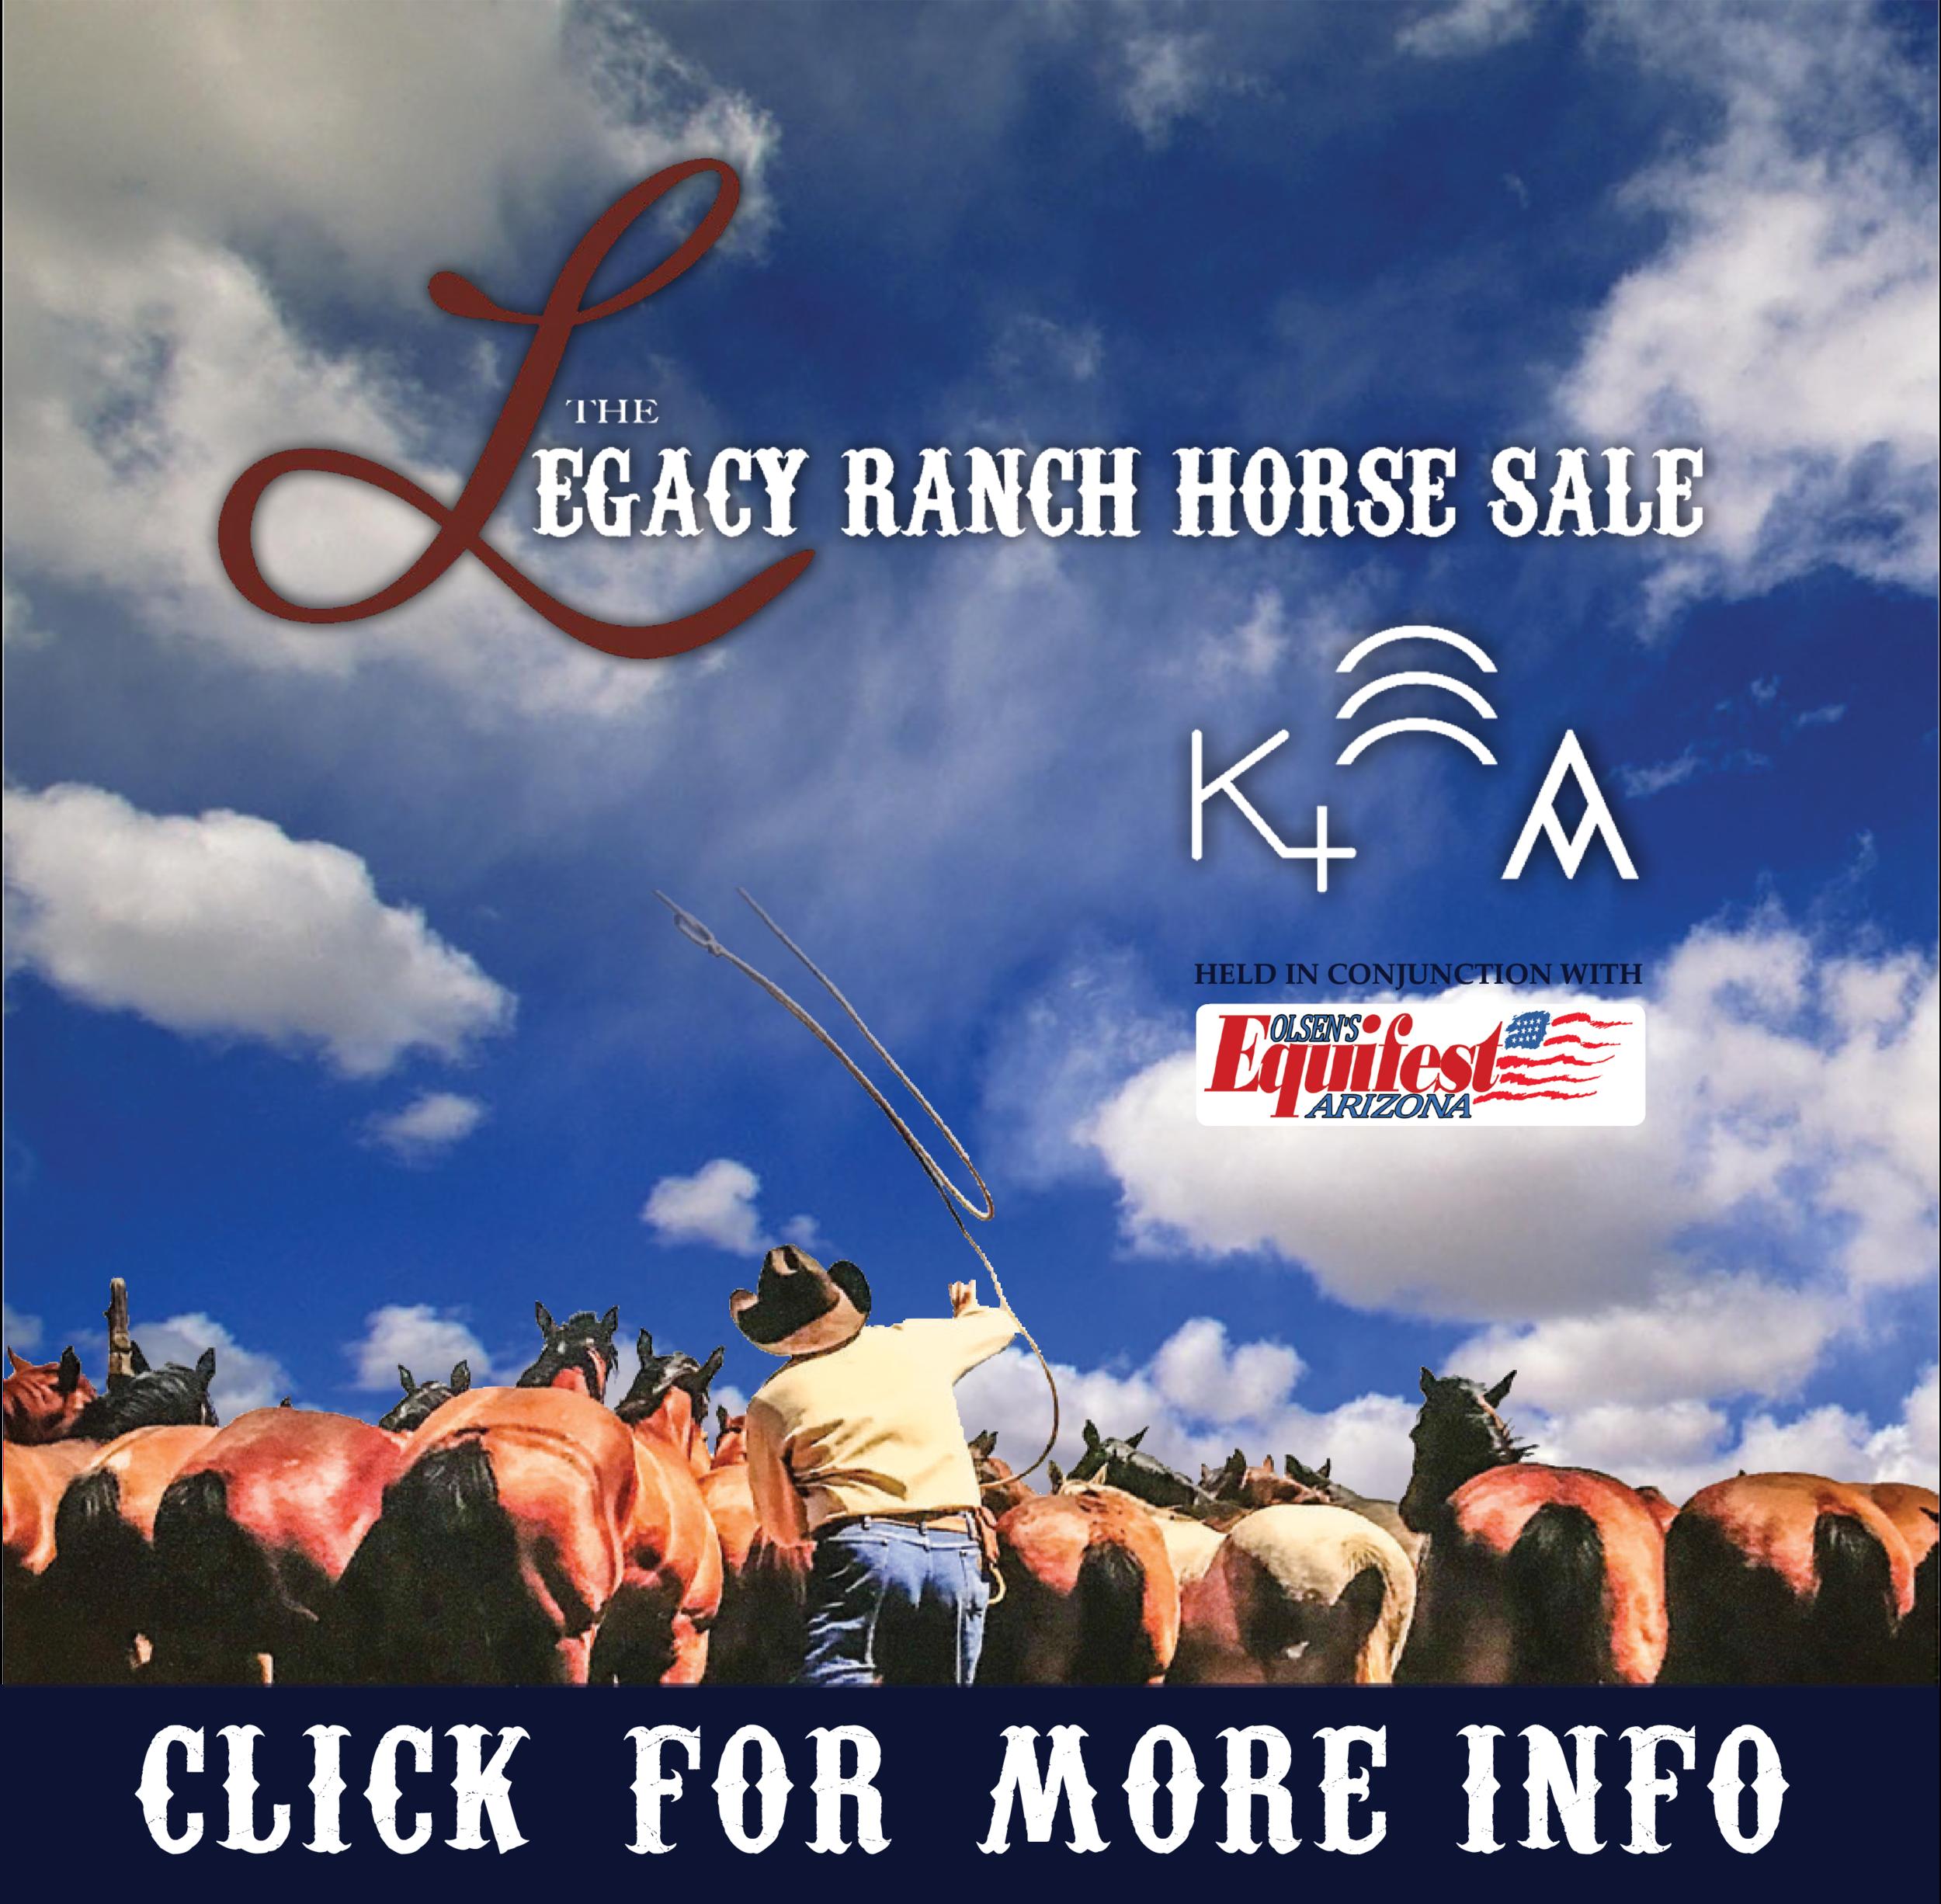 Legacy Horse: 520-360-9524